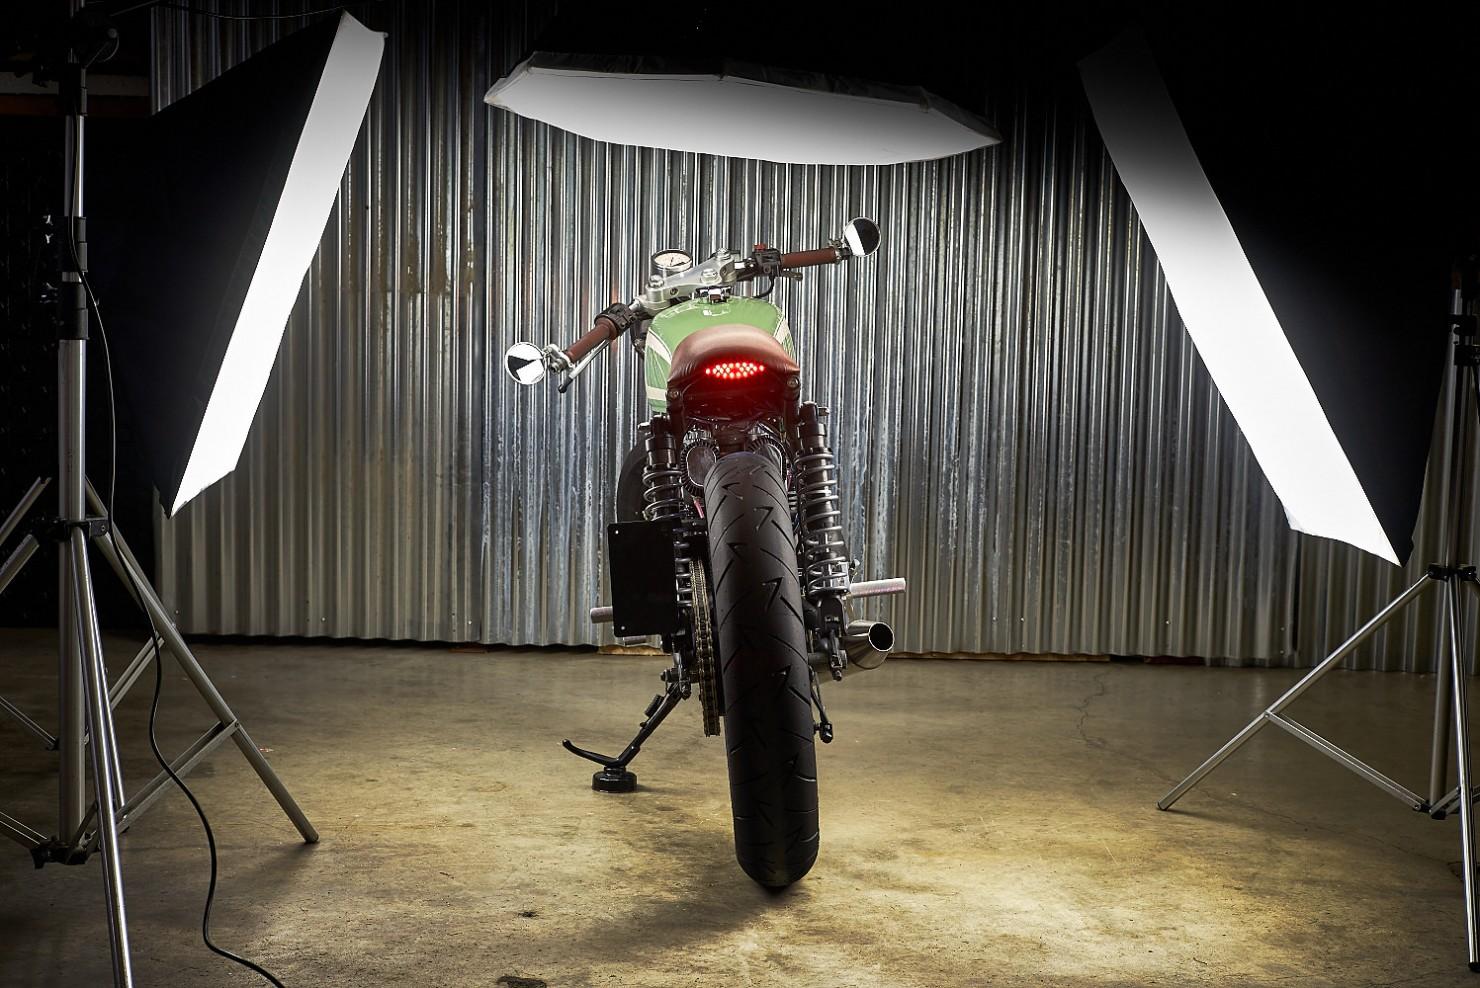 Honda-CB360-Motorcycle-9